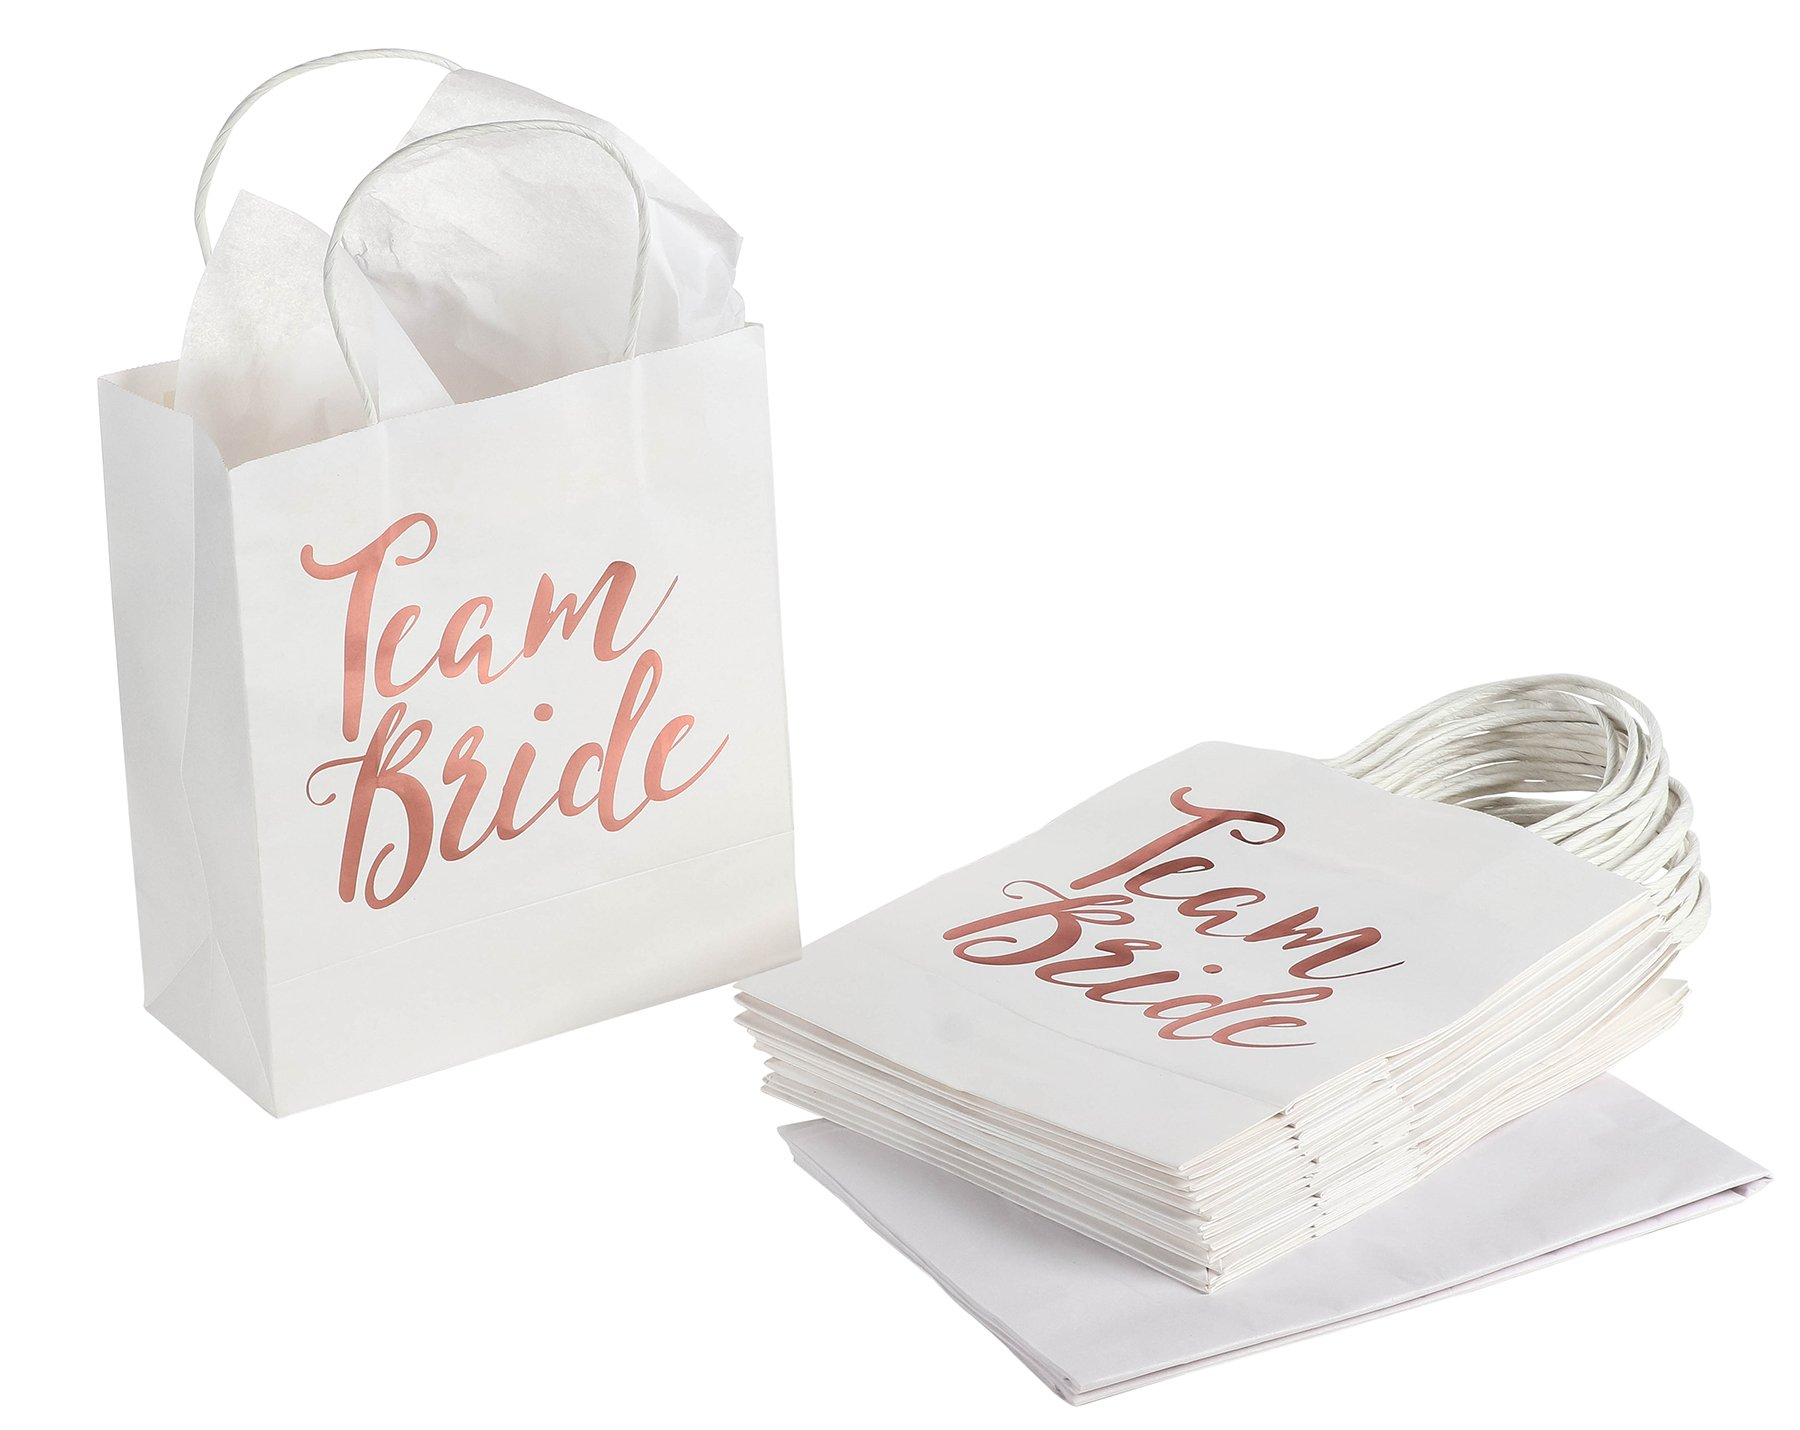 7ff71d346c3da Amazon.com  Bridesmaid Gift Bag - 15-Pack Team Bride White Paper Bag for  Bachelorette Party Favors